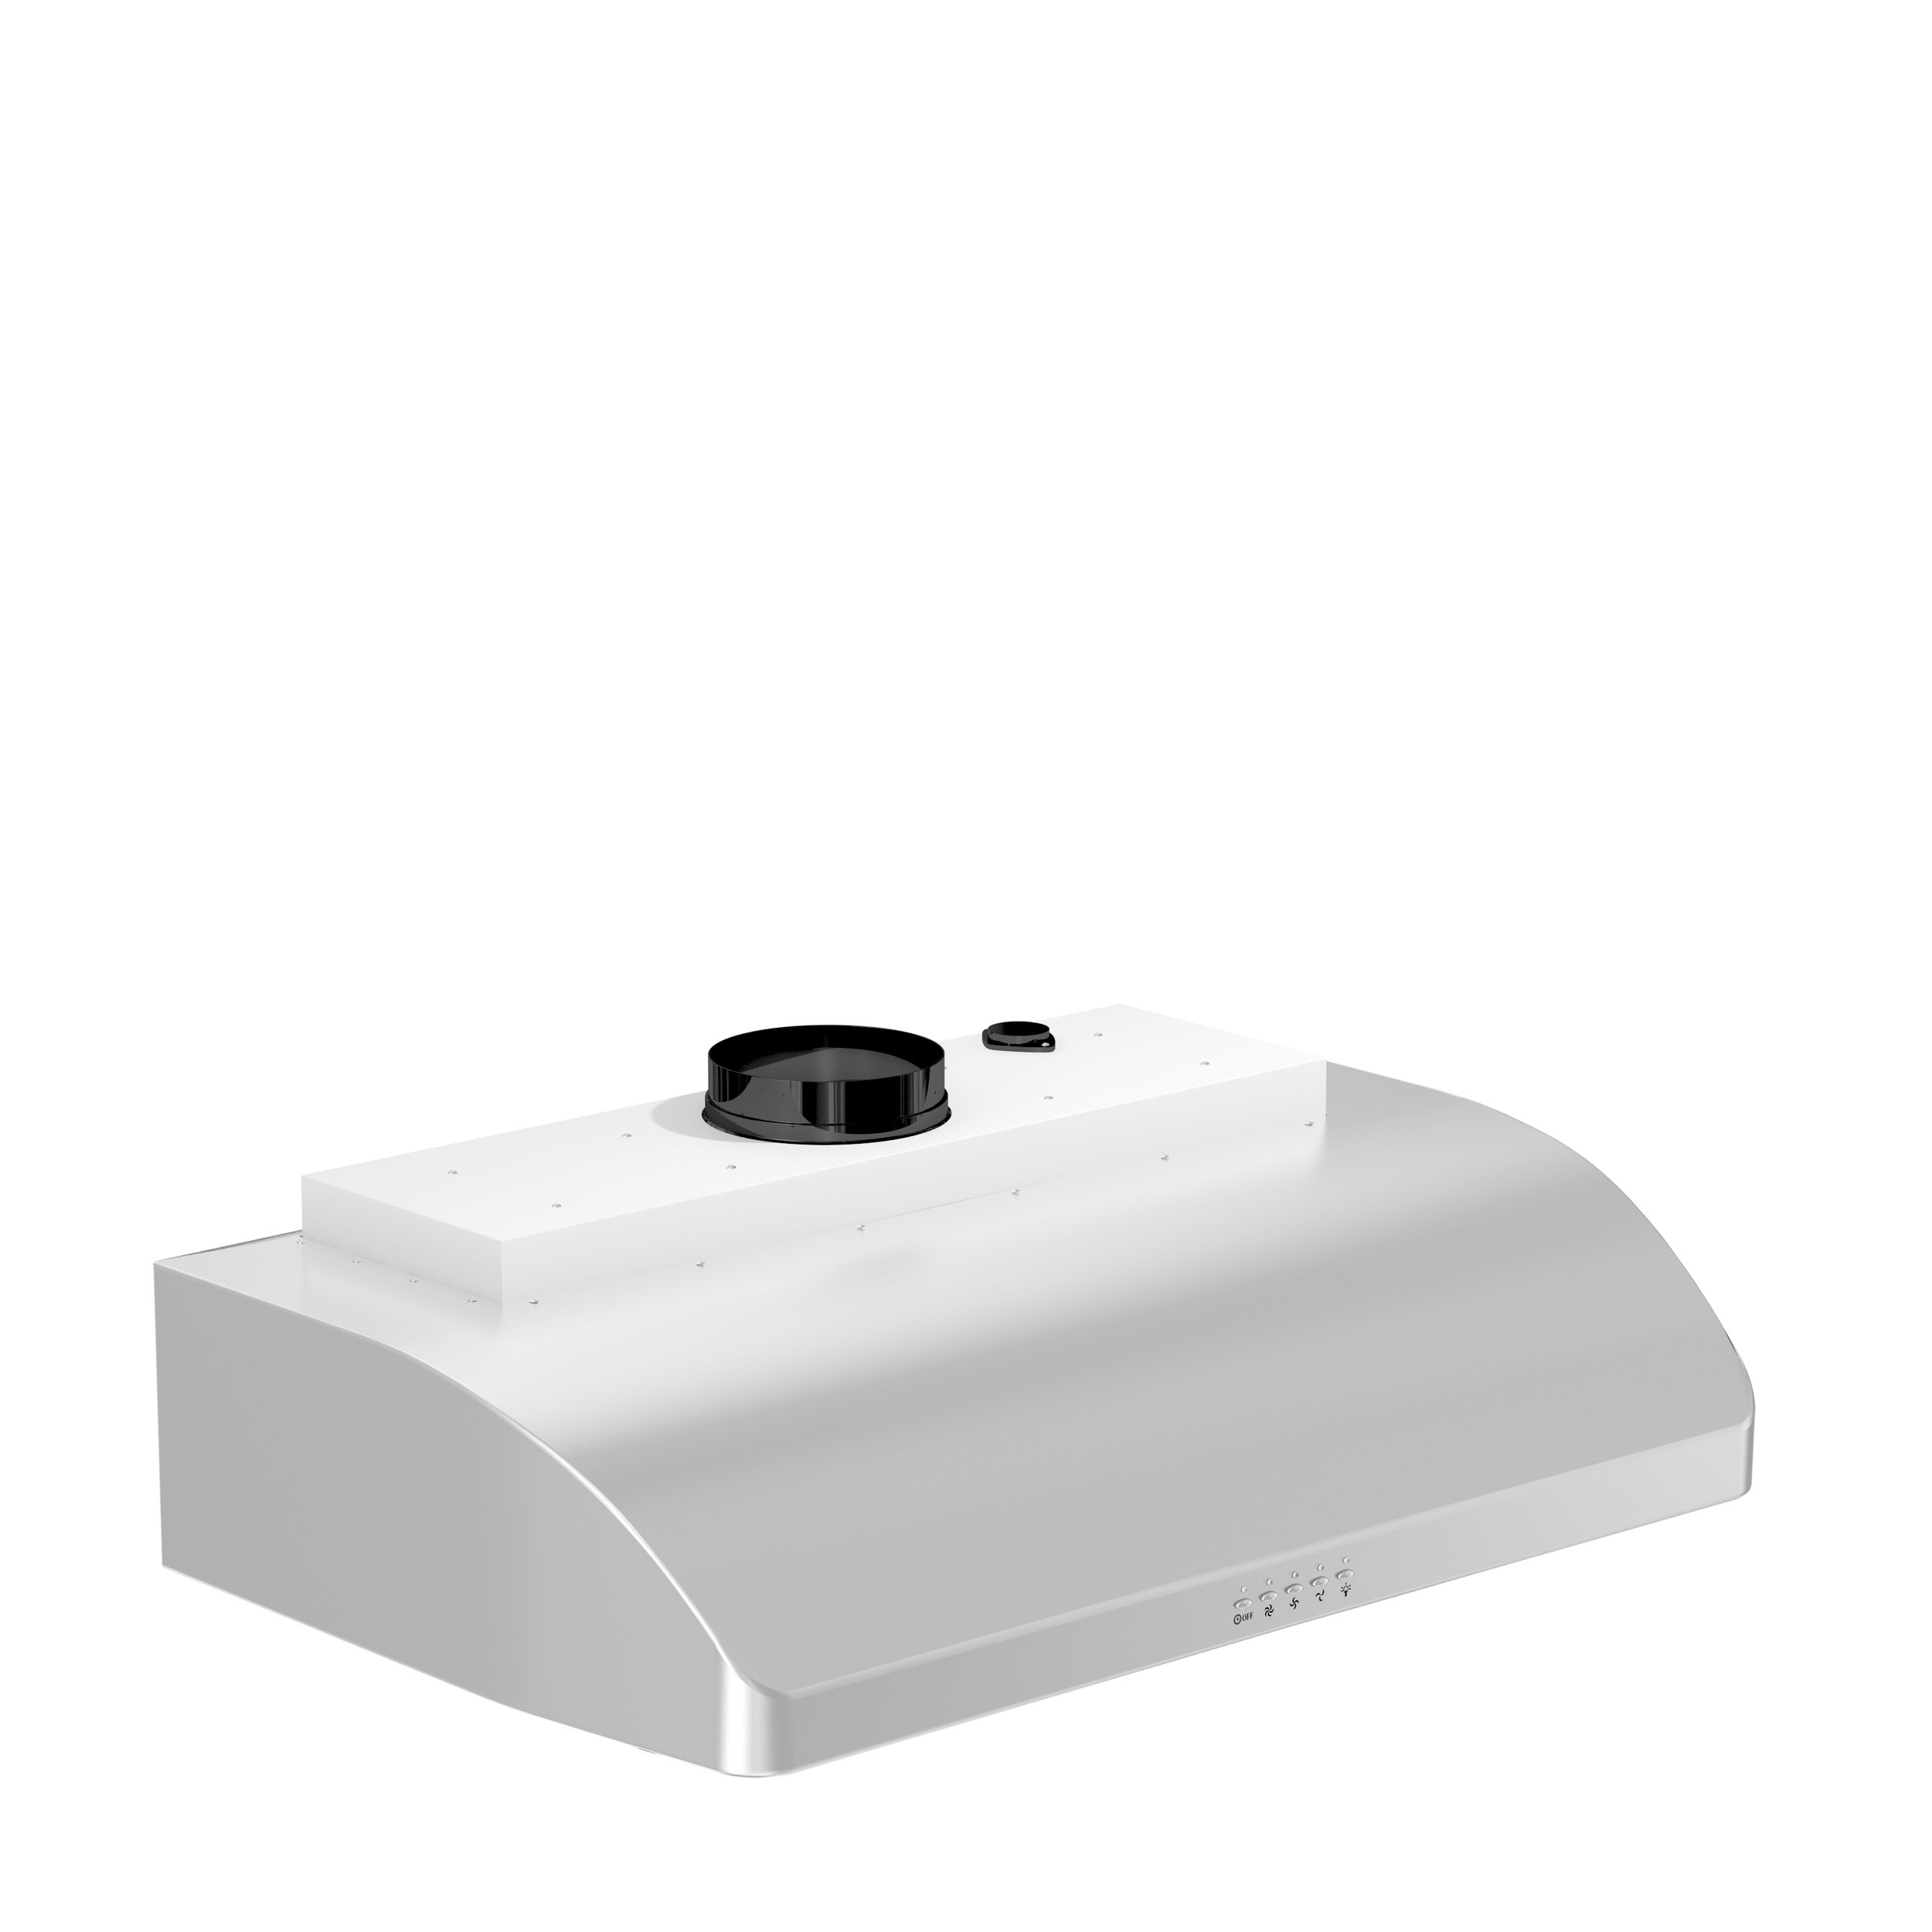 zline-stainless-steel-under-cabinet-range-hood-625-top.jpeg